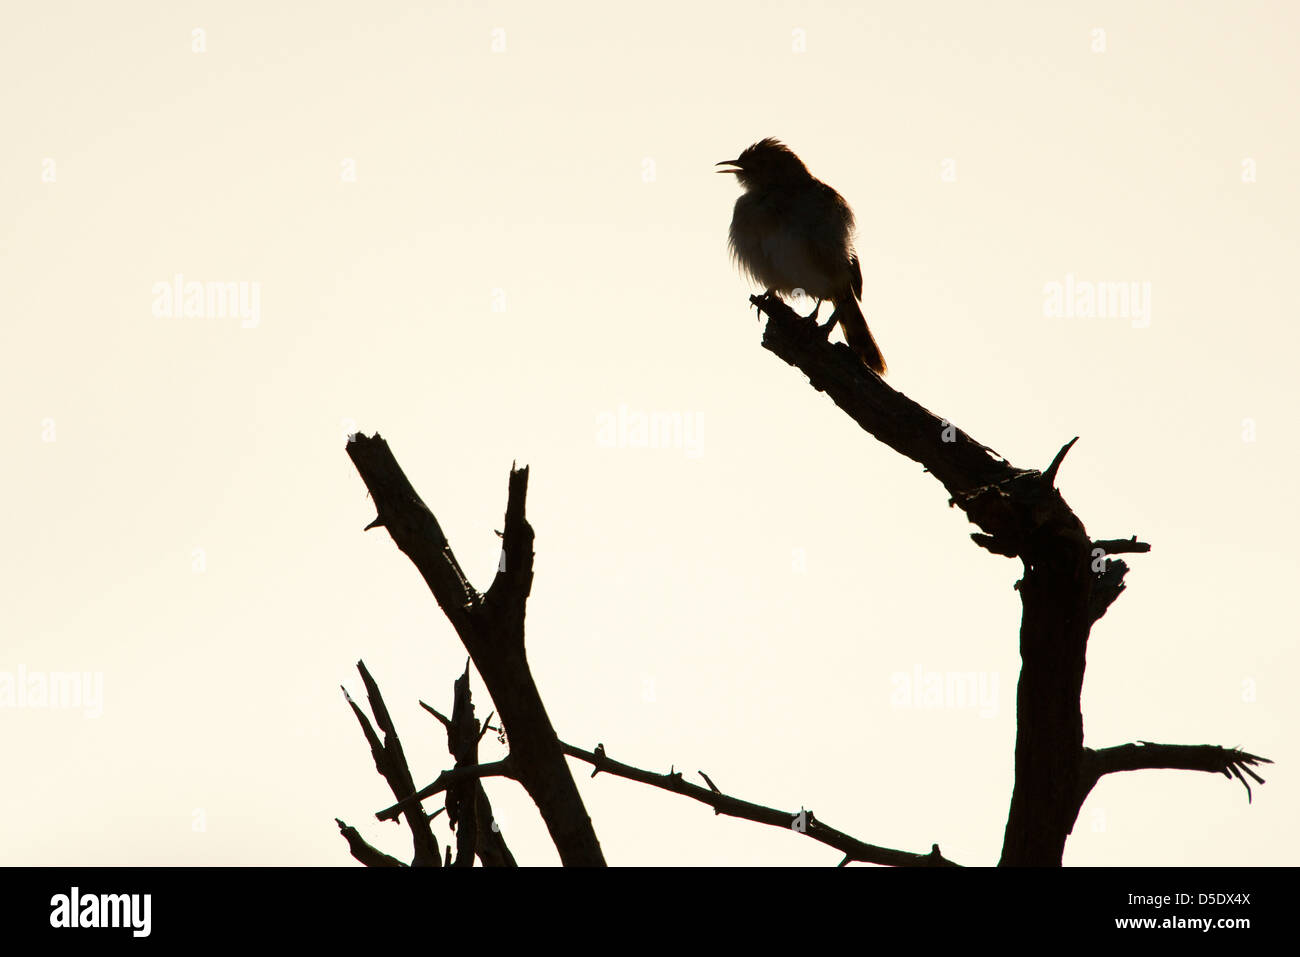 A Silhouette of a small Cisticolas bird sitting on a tree branch (Cisticola spp) - Stock Image